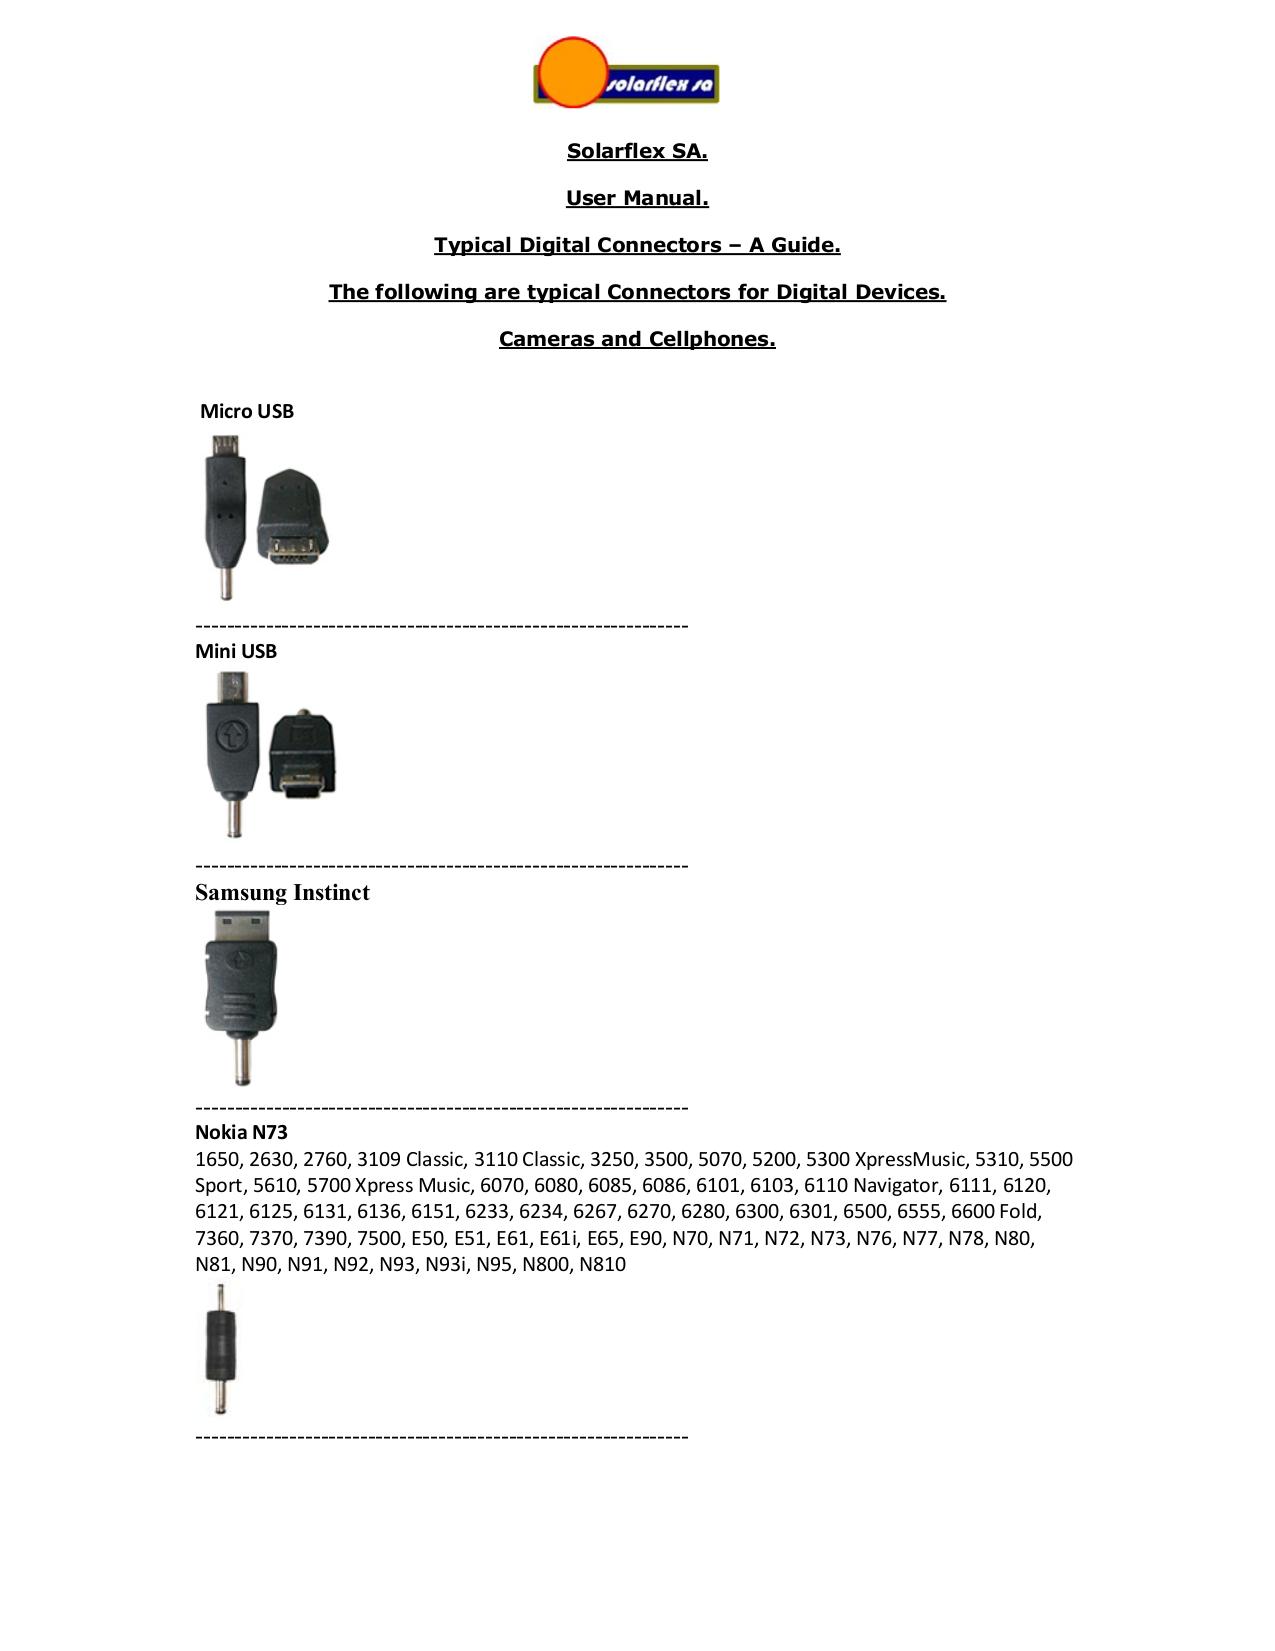 pdf for Nokia Cell Phone 2116i manual